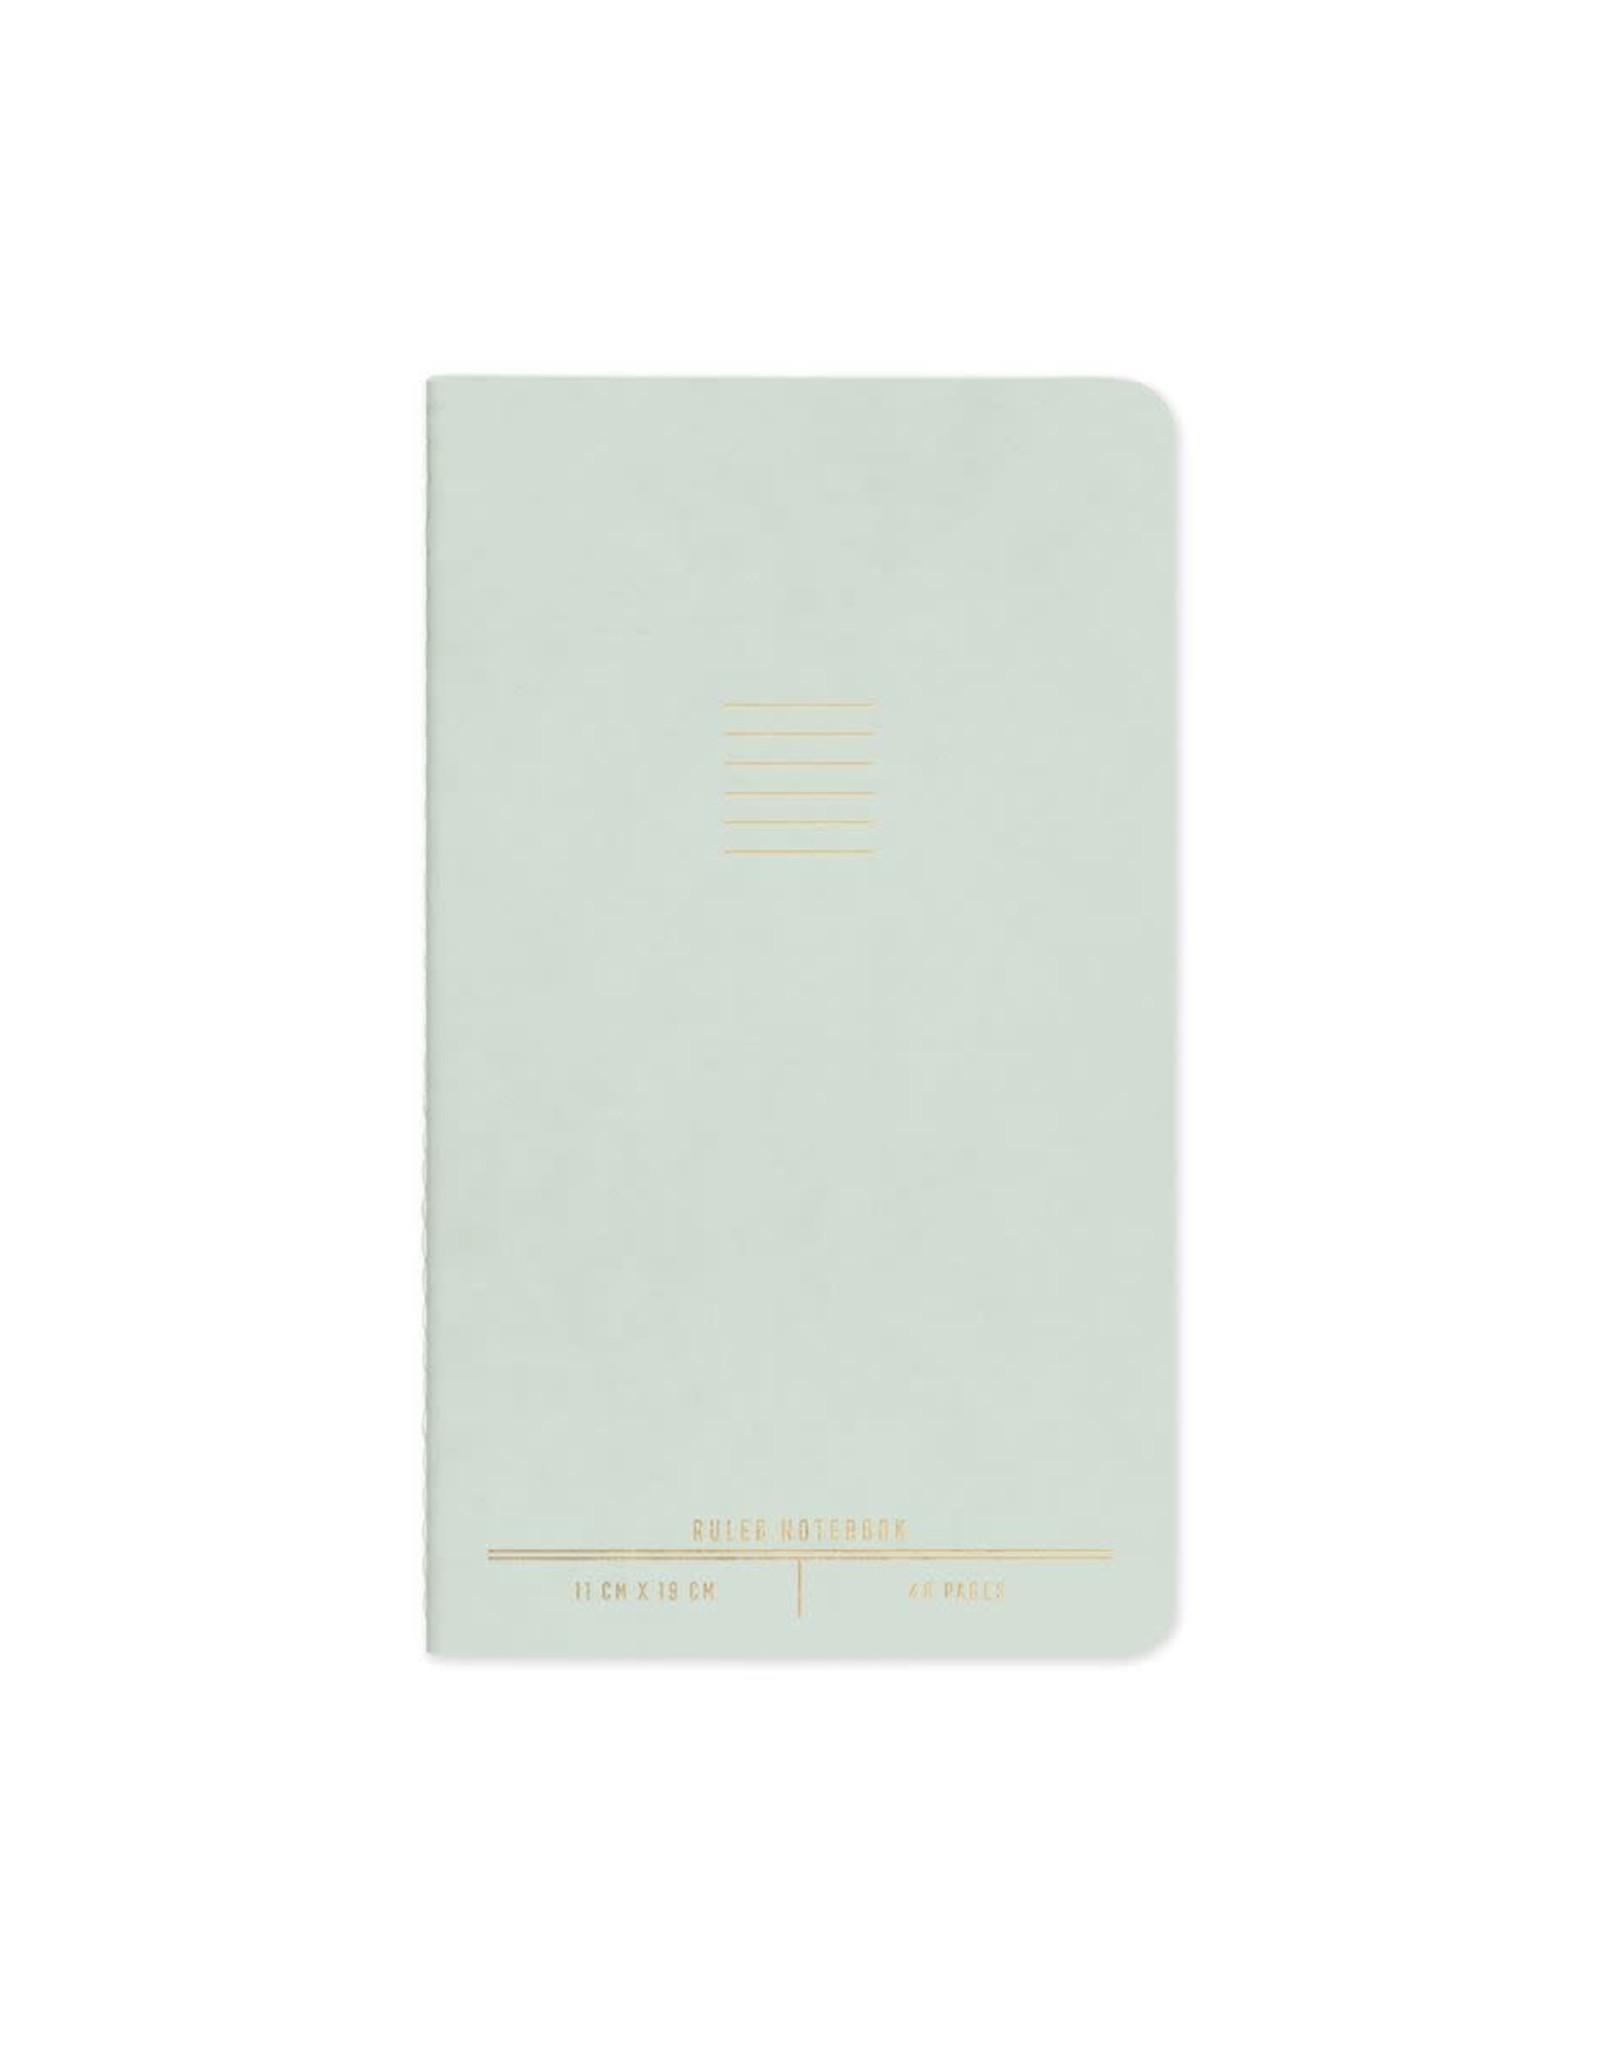 Designworks Ink Minimalist Single Flex Notebook